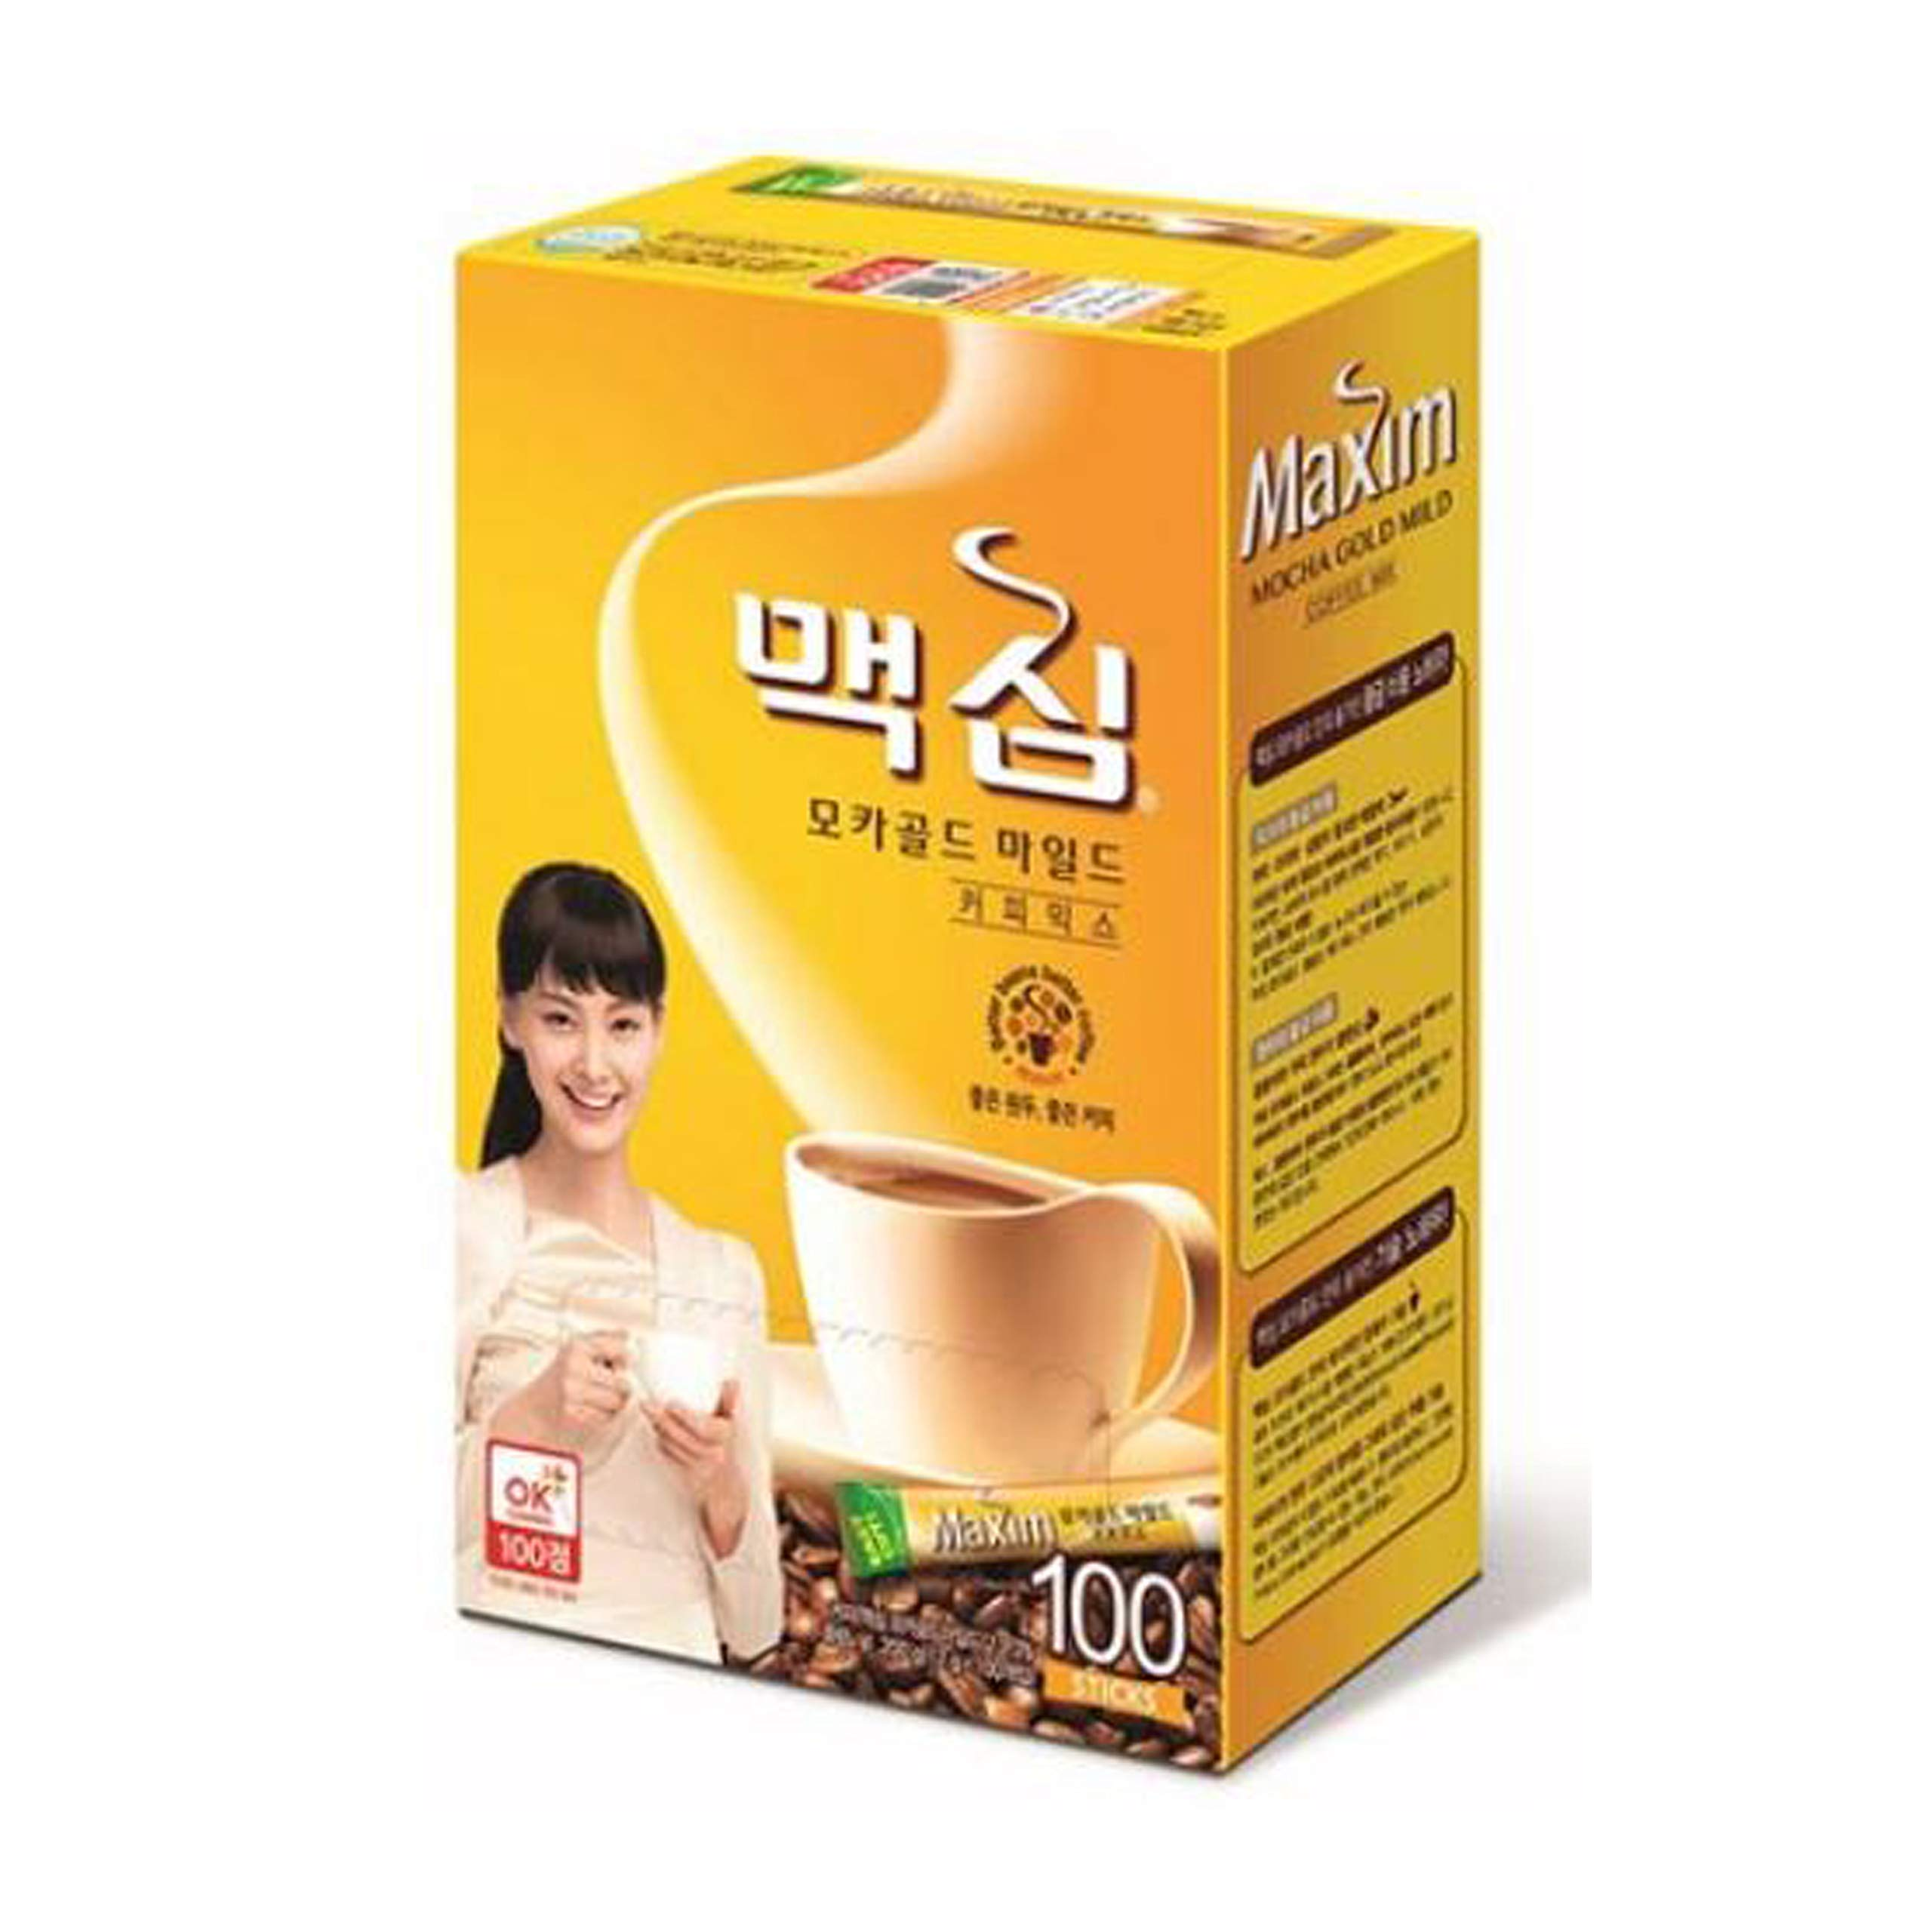 Maxim Mocha Gold Mild Coffee Mix - 100pks by Maxim